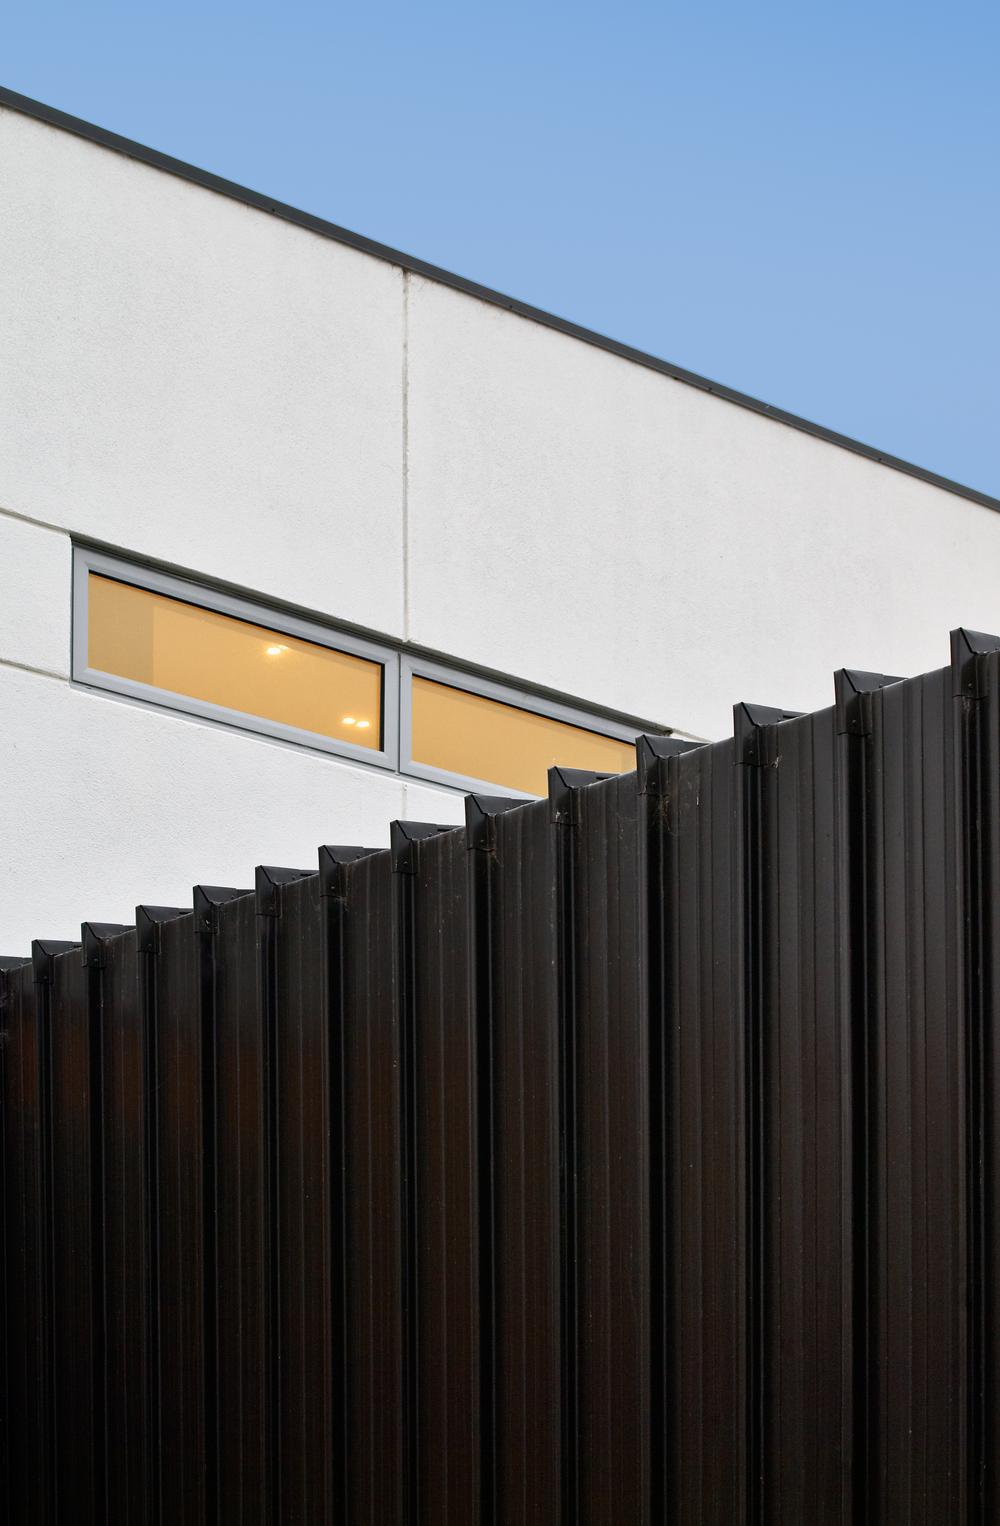 090614_Stufkens_Architecture_Lin_McCaughan_006_exterior_detail.jpg